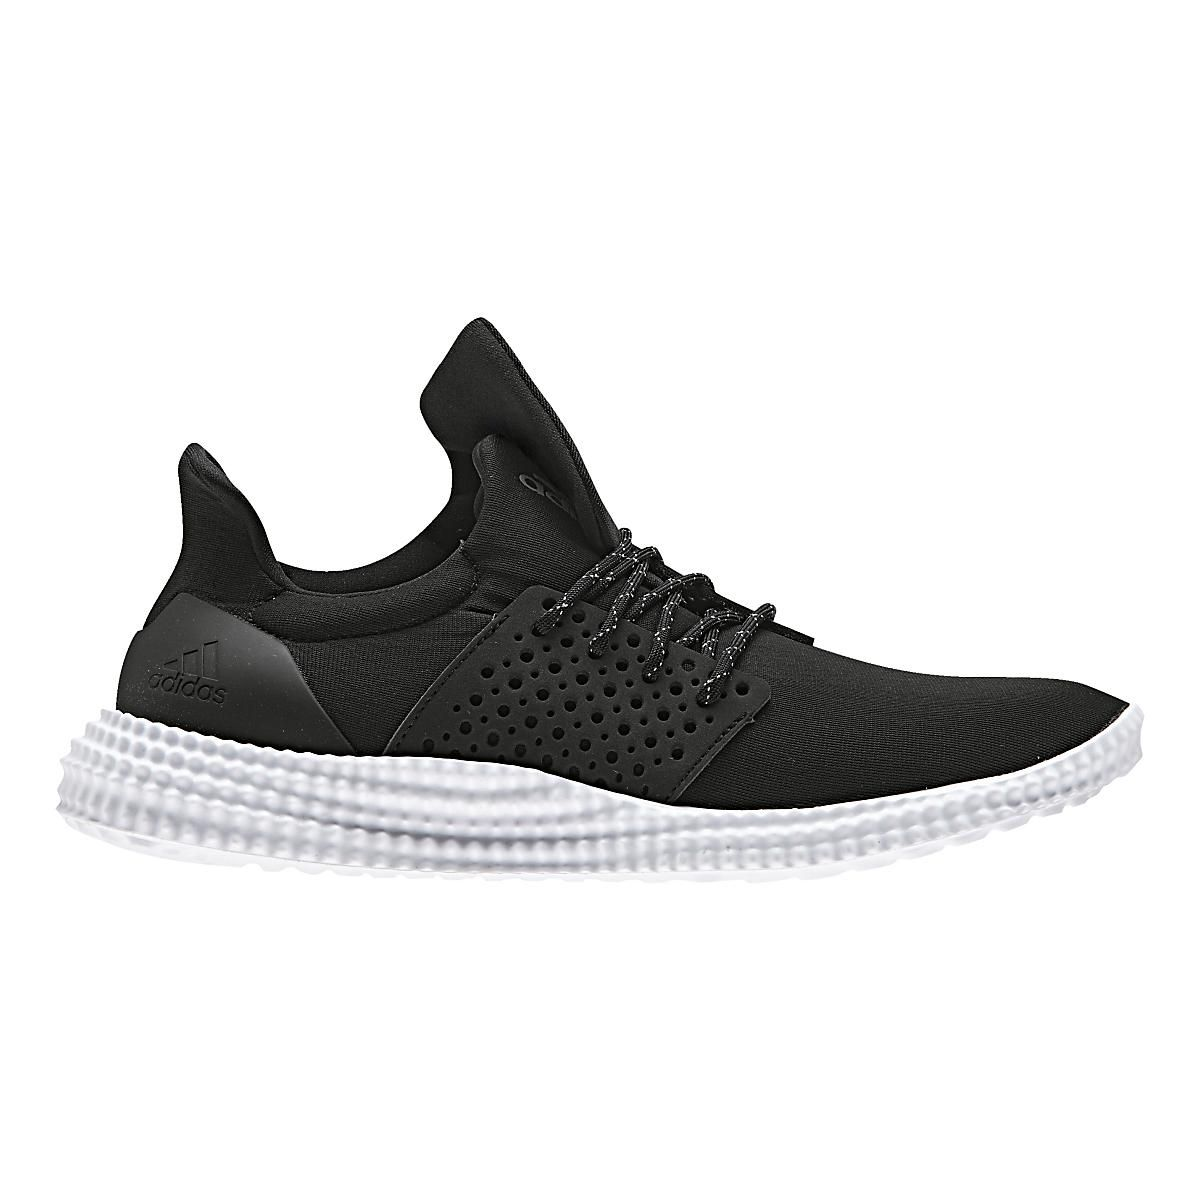 Mens adidas Athletics 24/7 Cross Training Shoe | Sneakers men ...